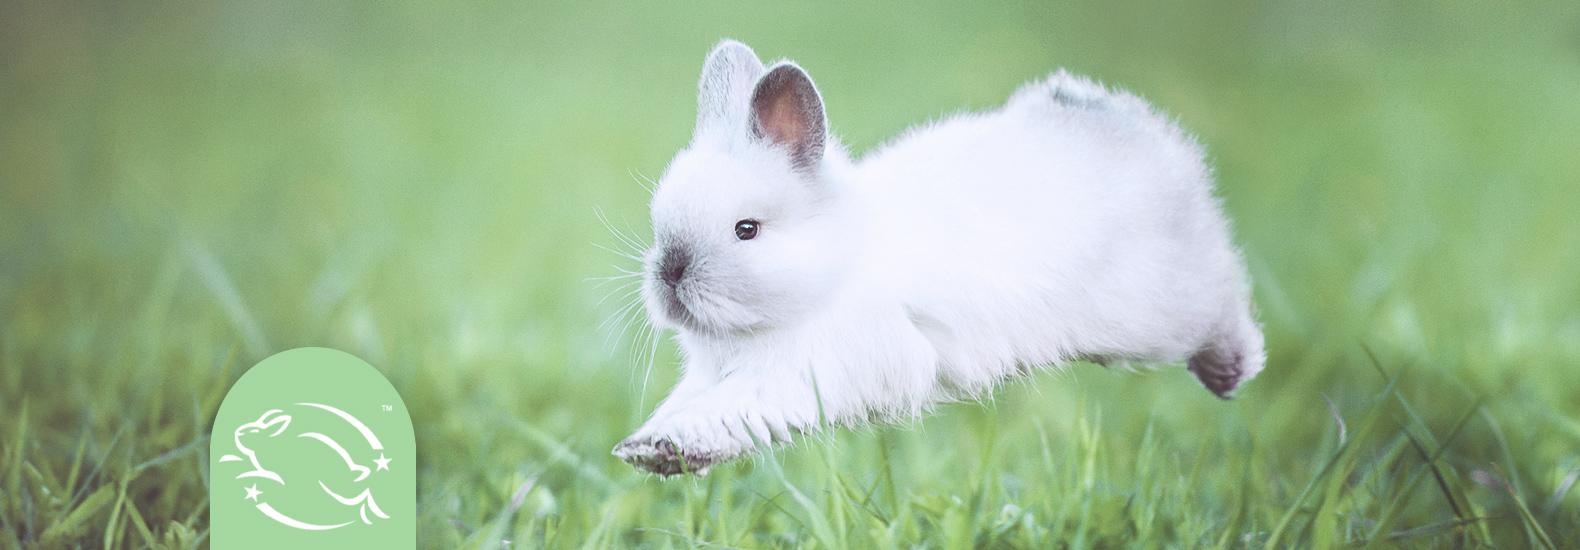 Cosmética cruelty free que no maltrata animales